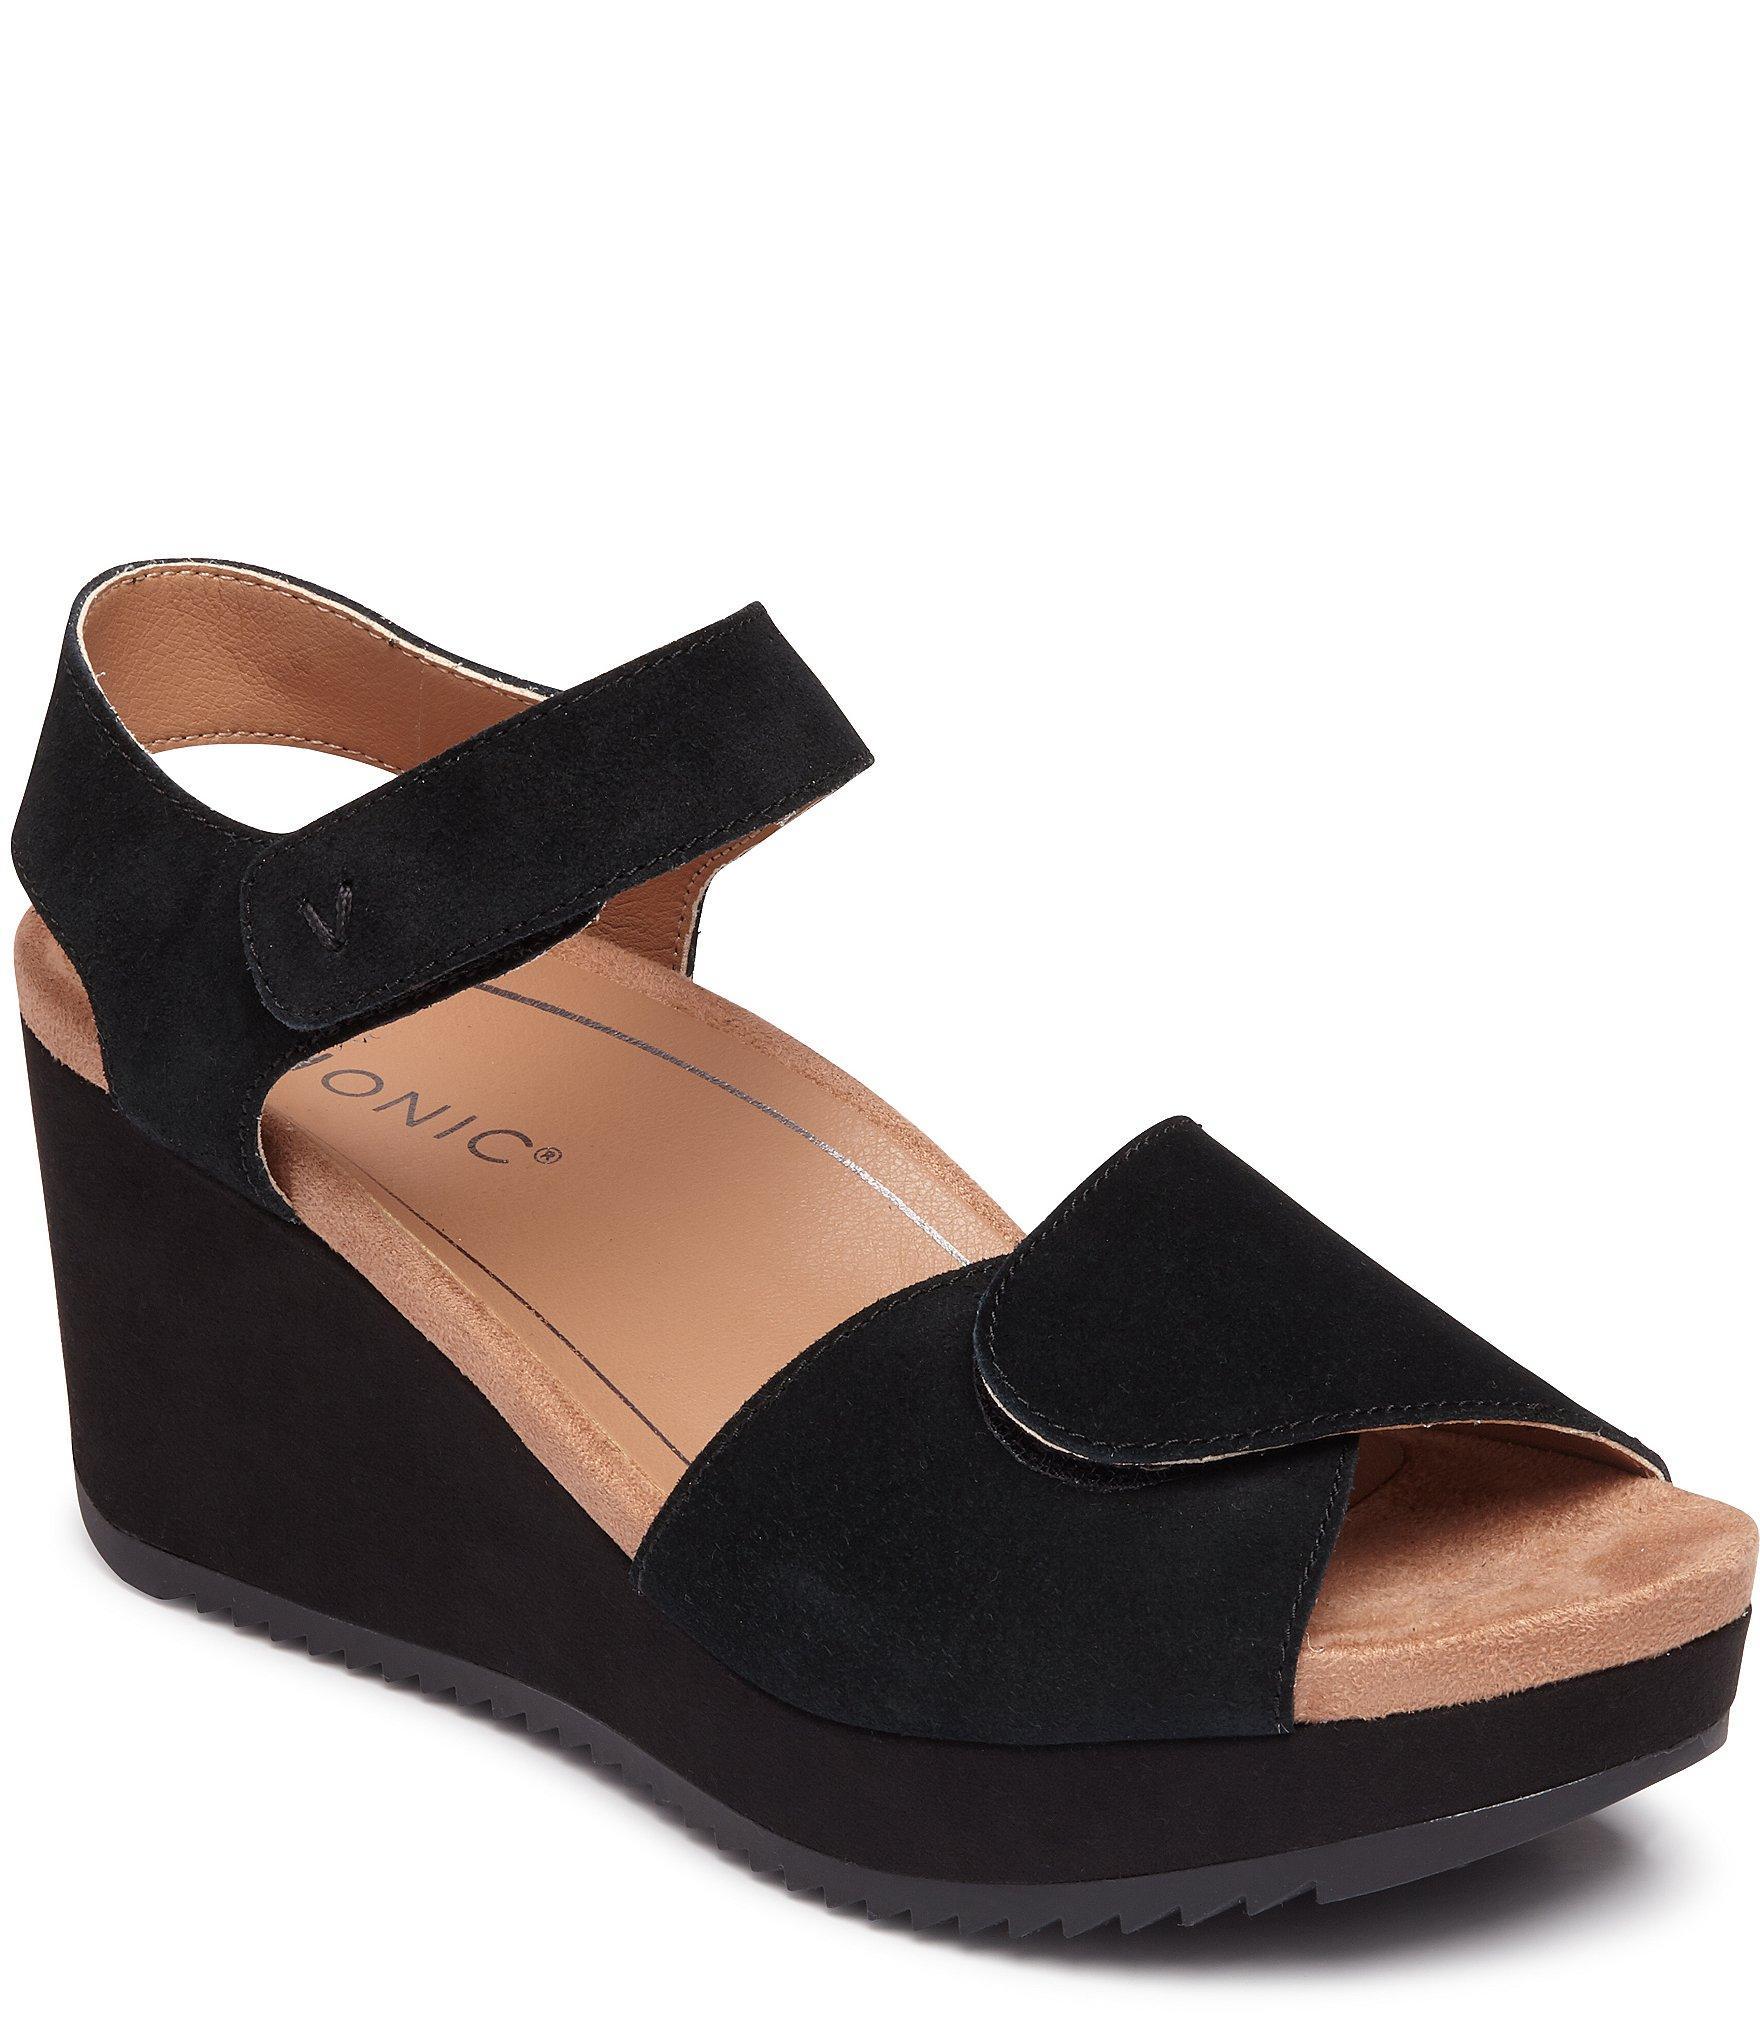 "ASTRID Stilettos Party Stylish 6/"" High Heel 2/"" Platform Women Shoes Black 6"